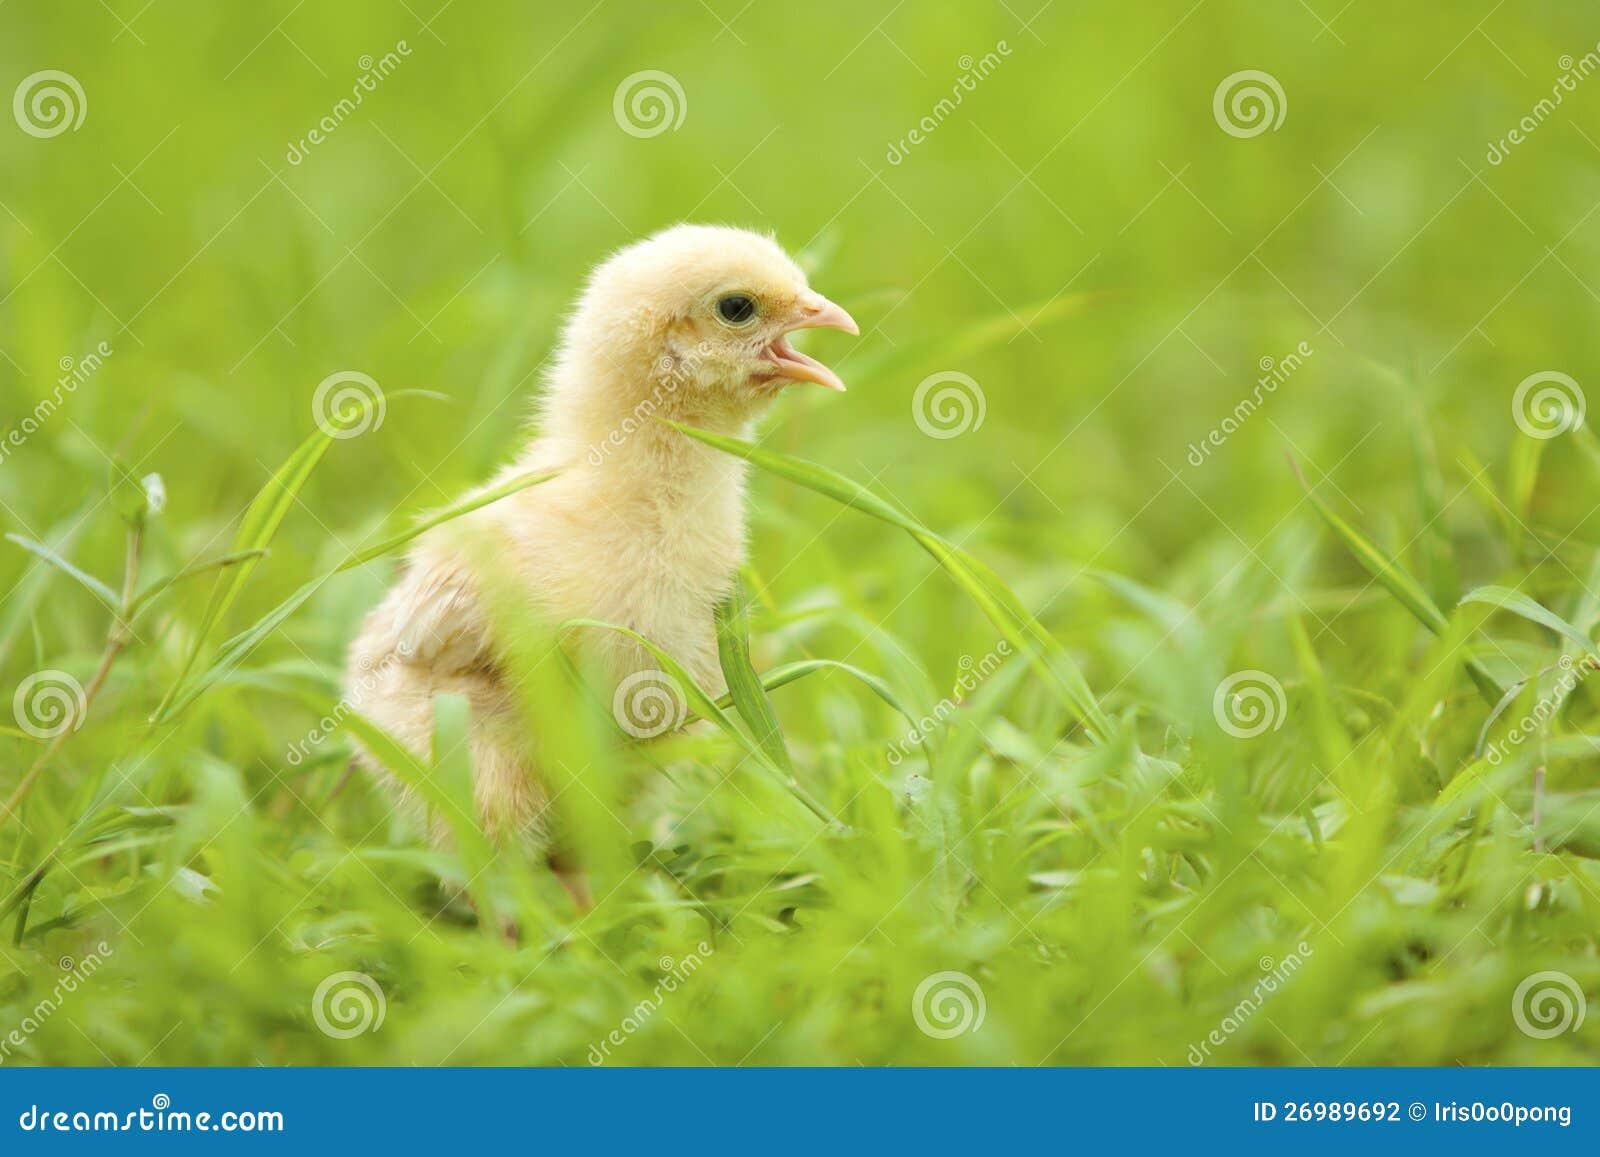 Crying Little Chicken Stock Image Cartoondealer Com